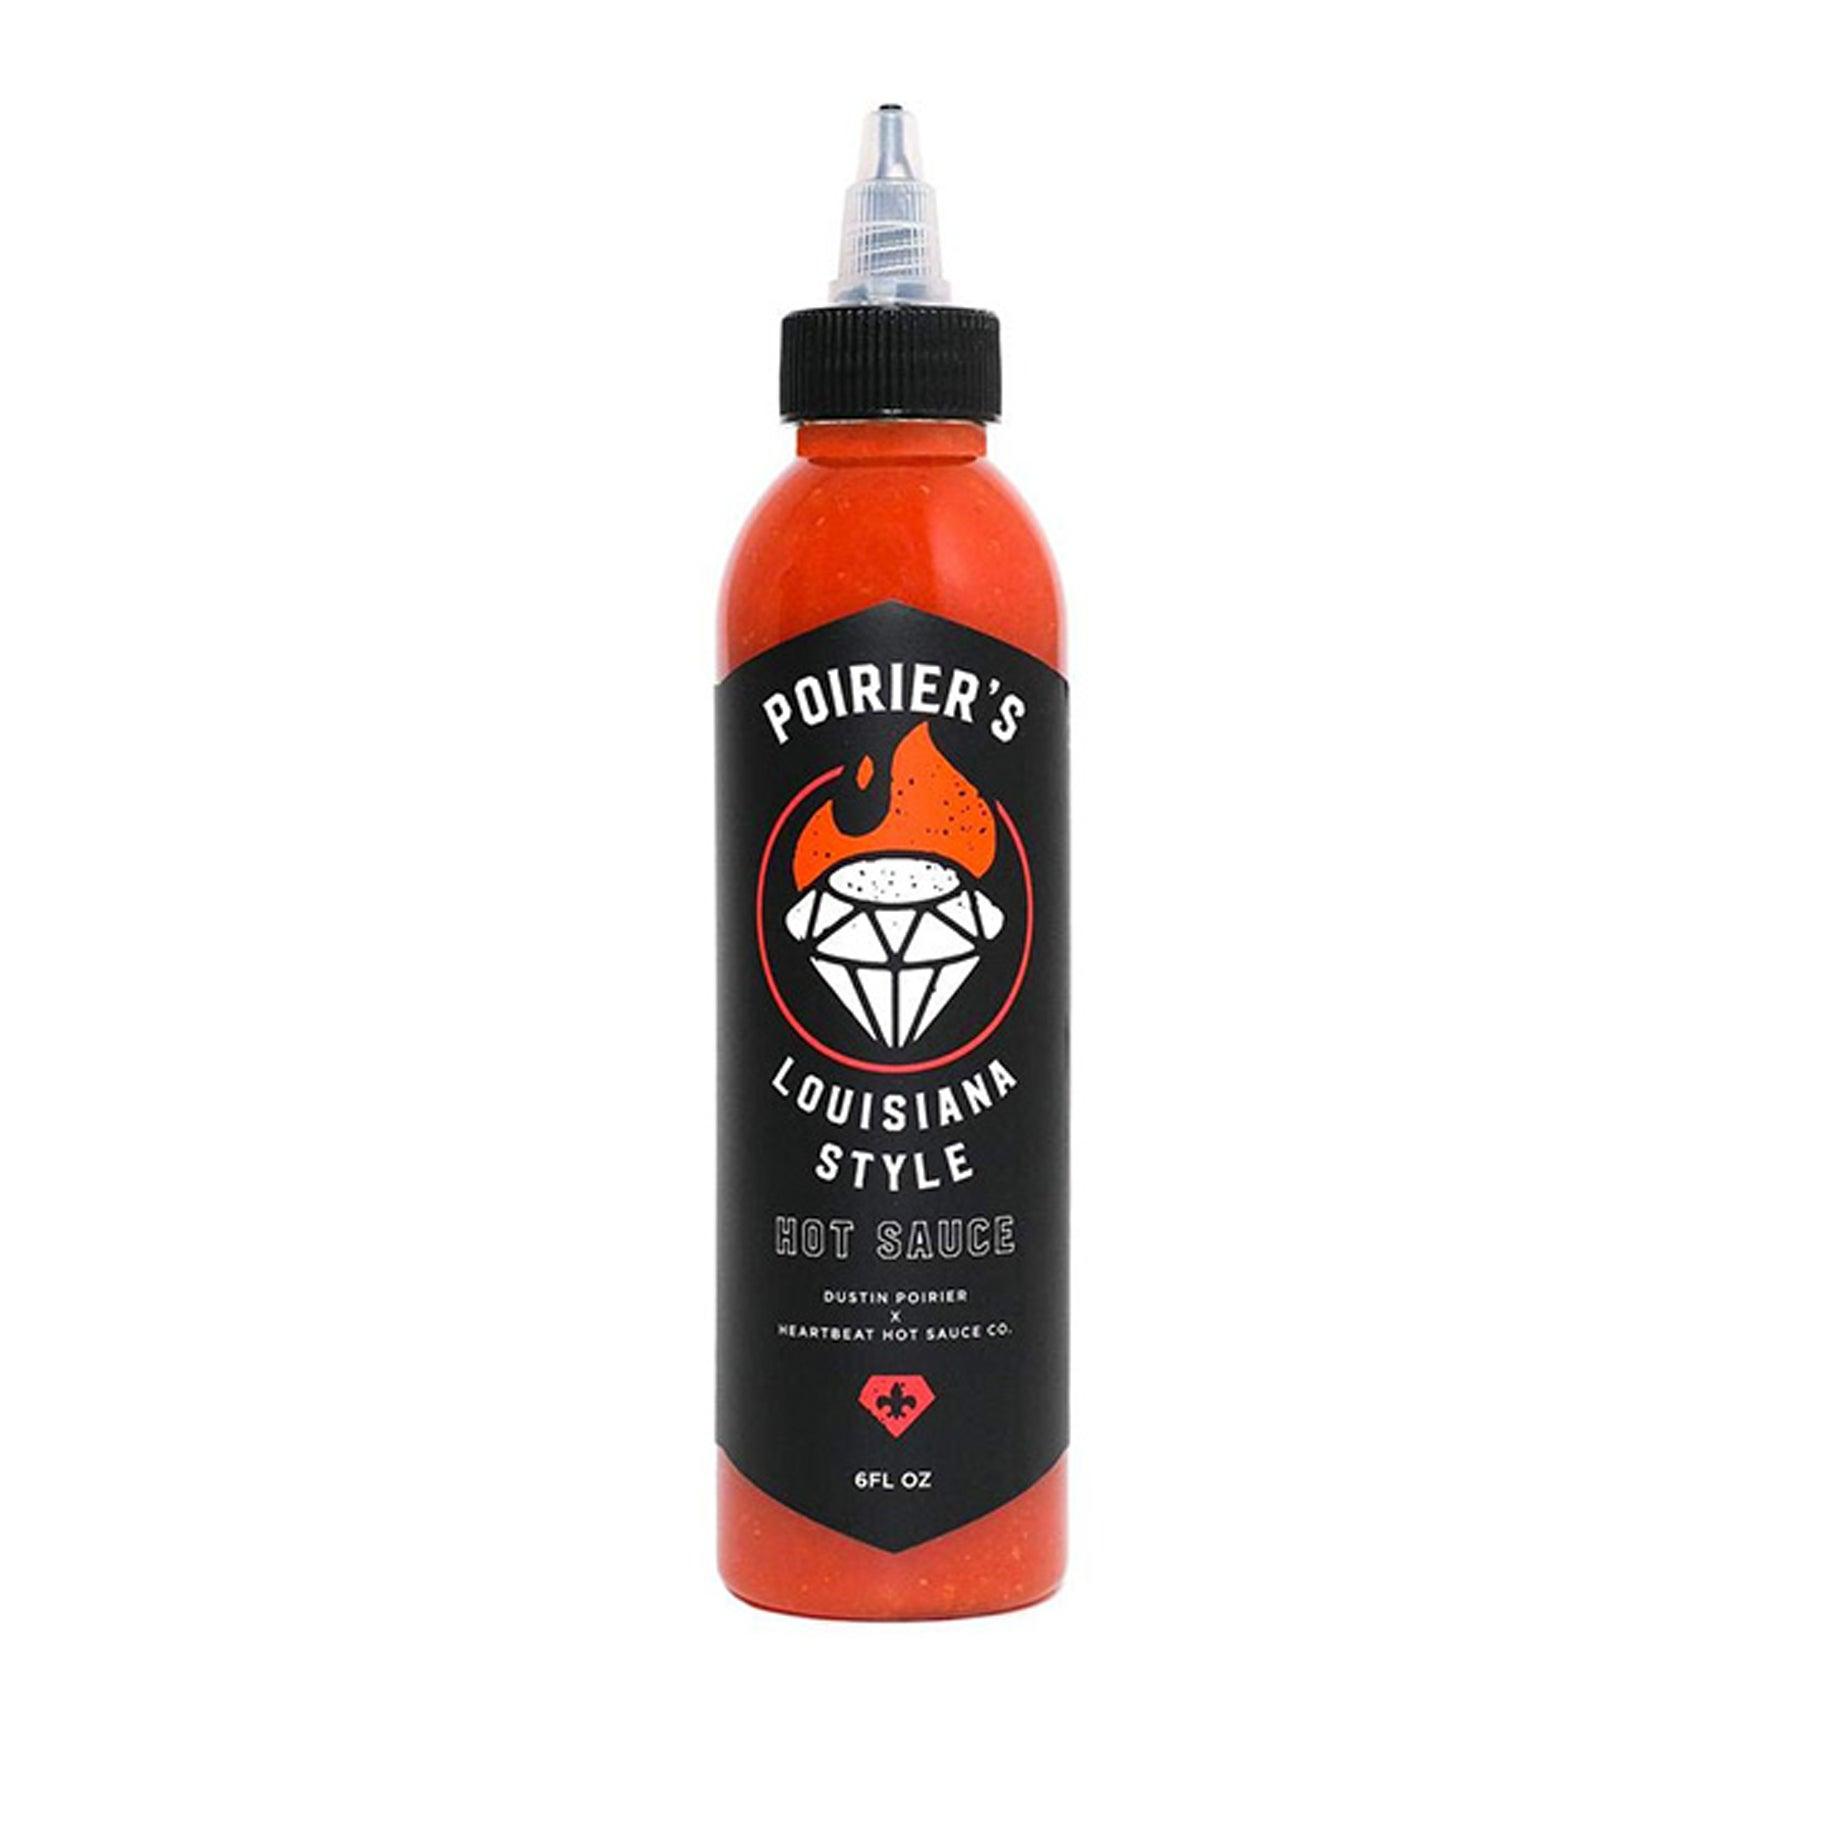 The Best Hot Sauces Option: Heartbeat Hot Sauce Poirier's Louisiana Style Hot Sauce